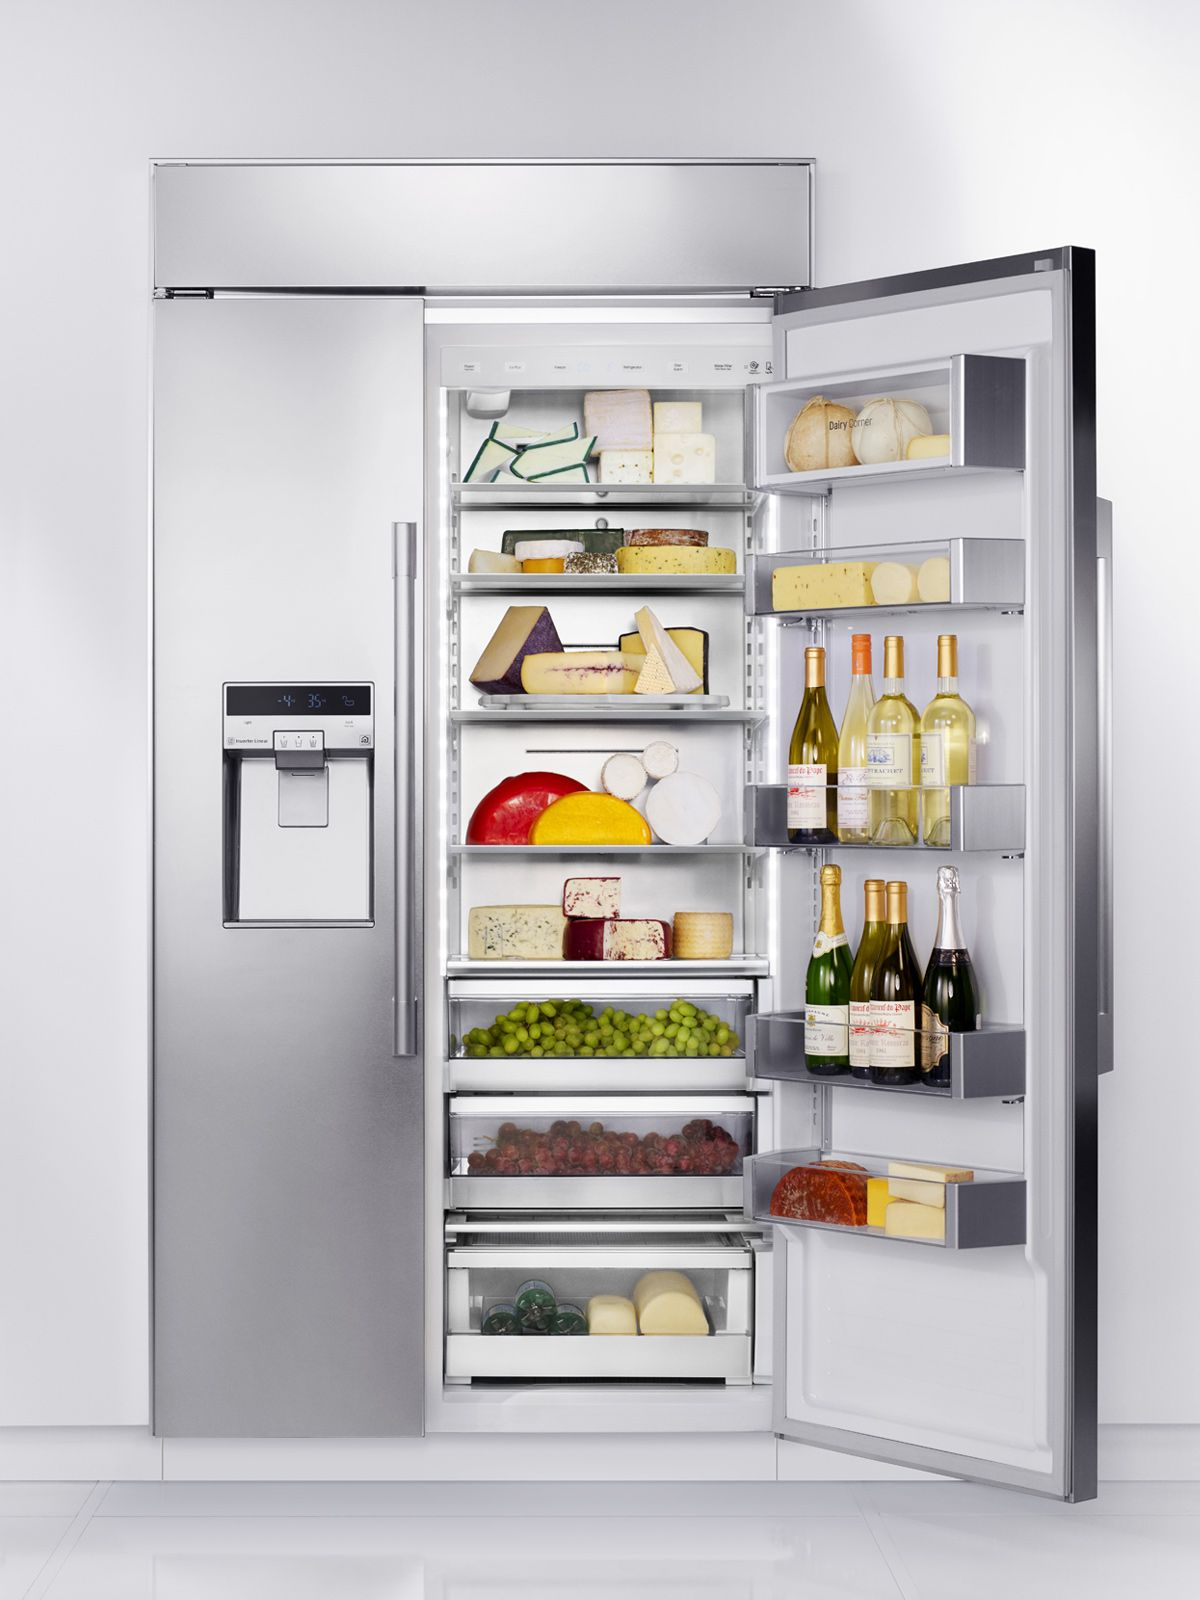 Builtin refrigerators panel ready built in kitchen